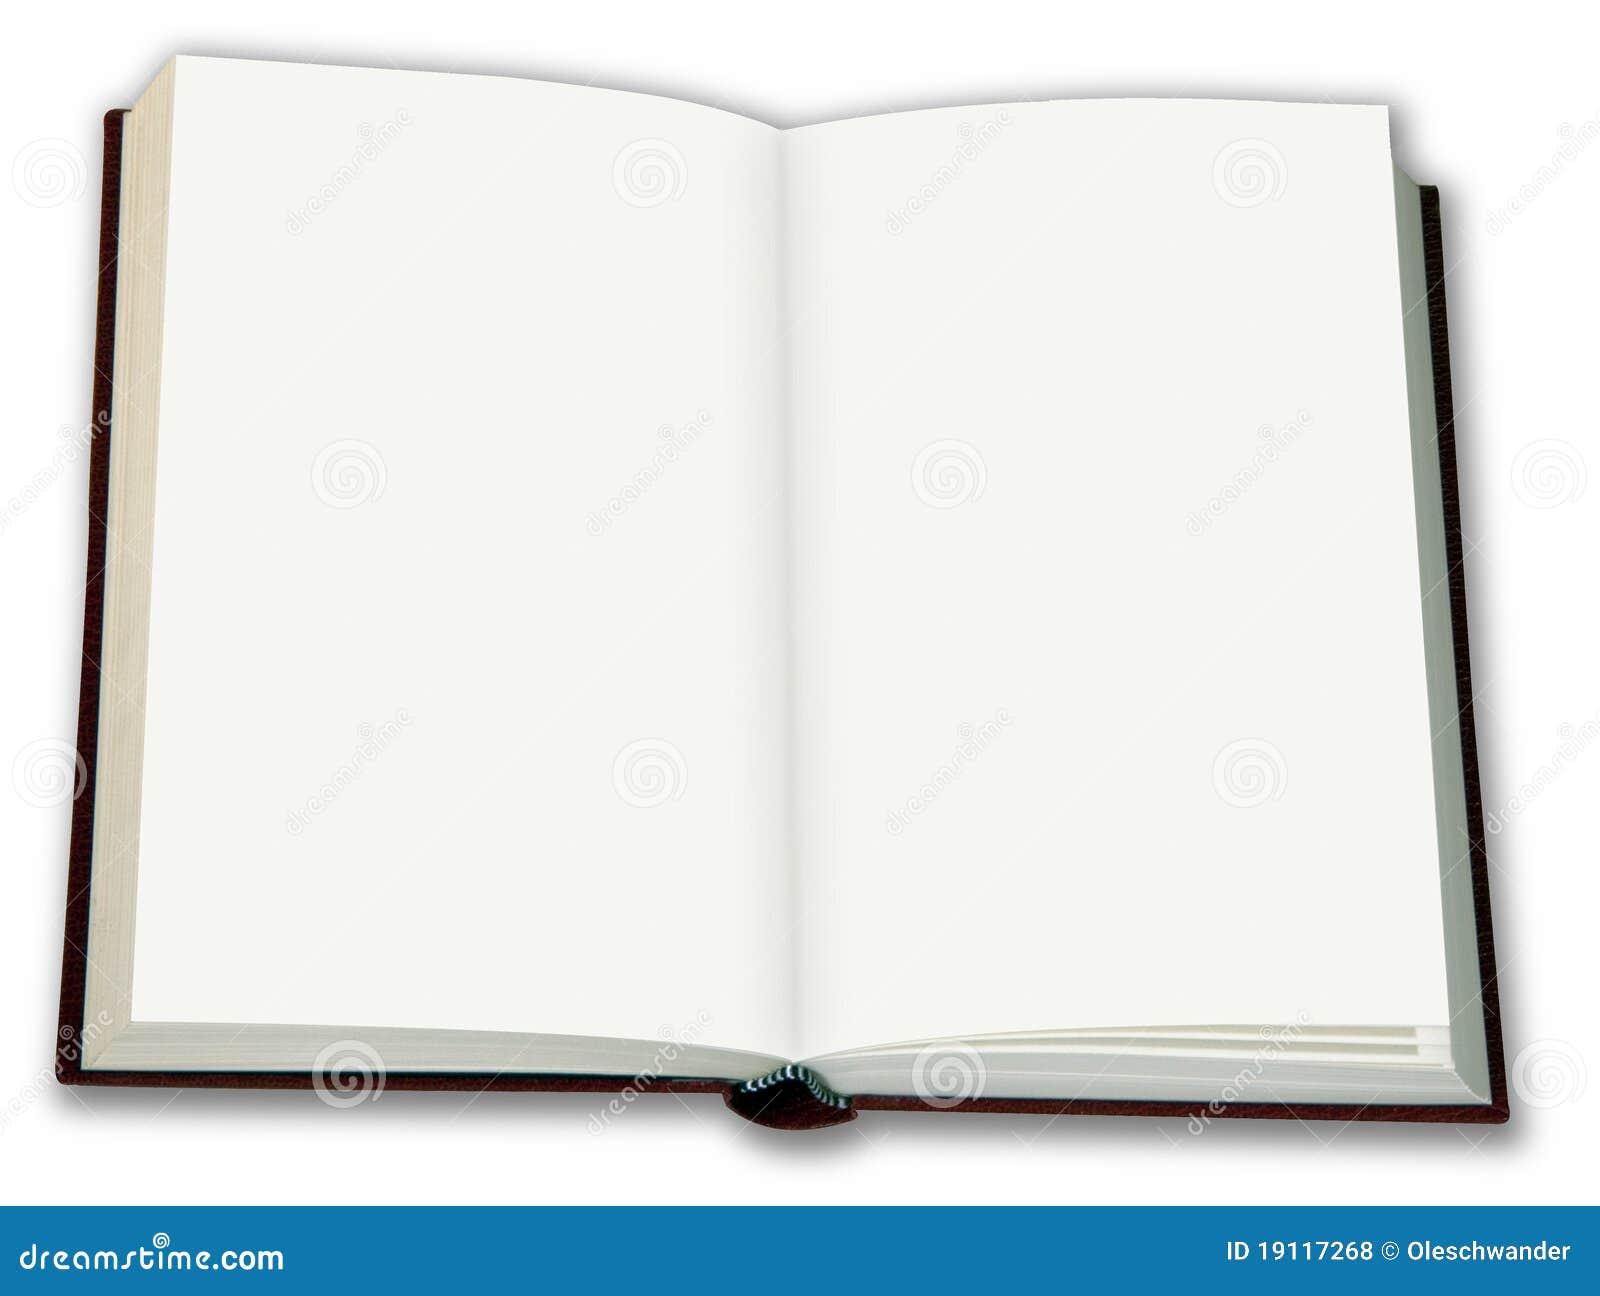 Anule O Livro Aberto Isolado No Branco Fotos de Stock Royalty Free - Imagem: 19117268